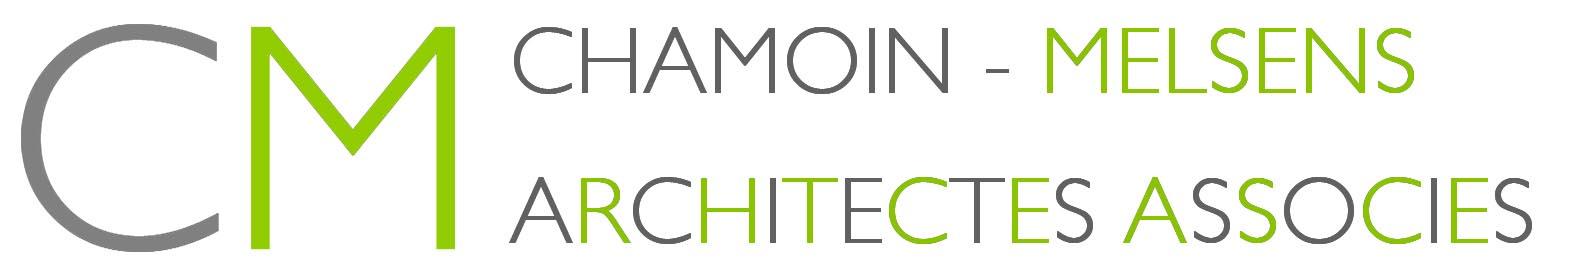 Chamoin-Melsens – Architectes associés